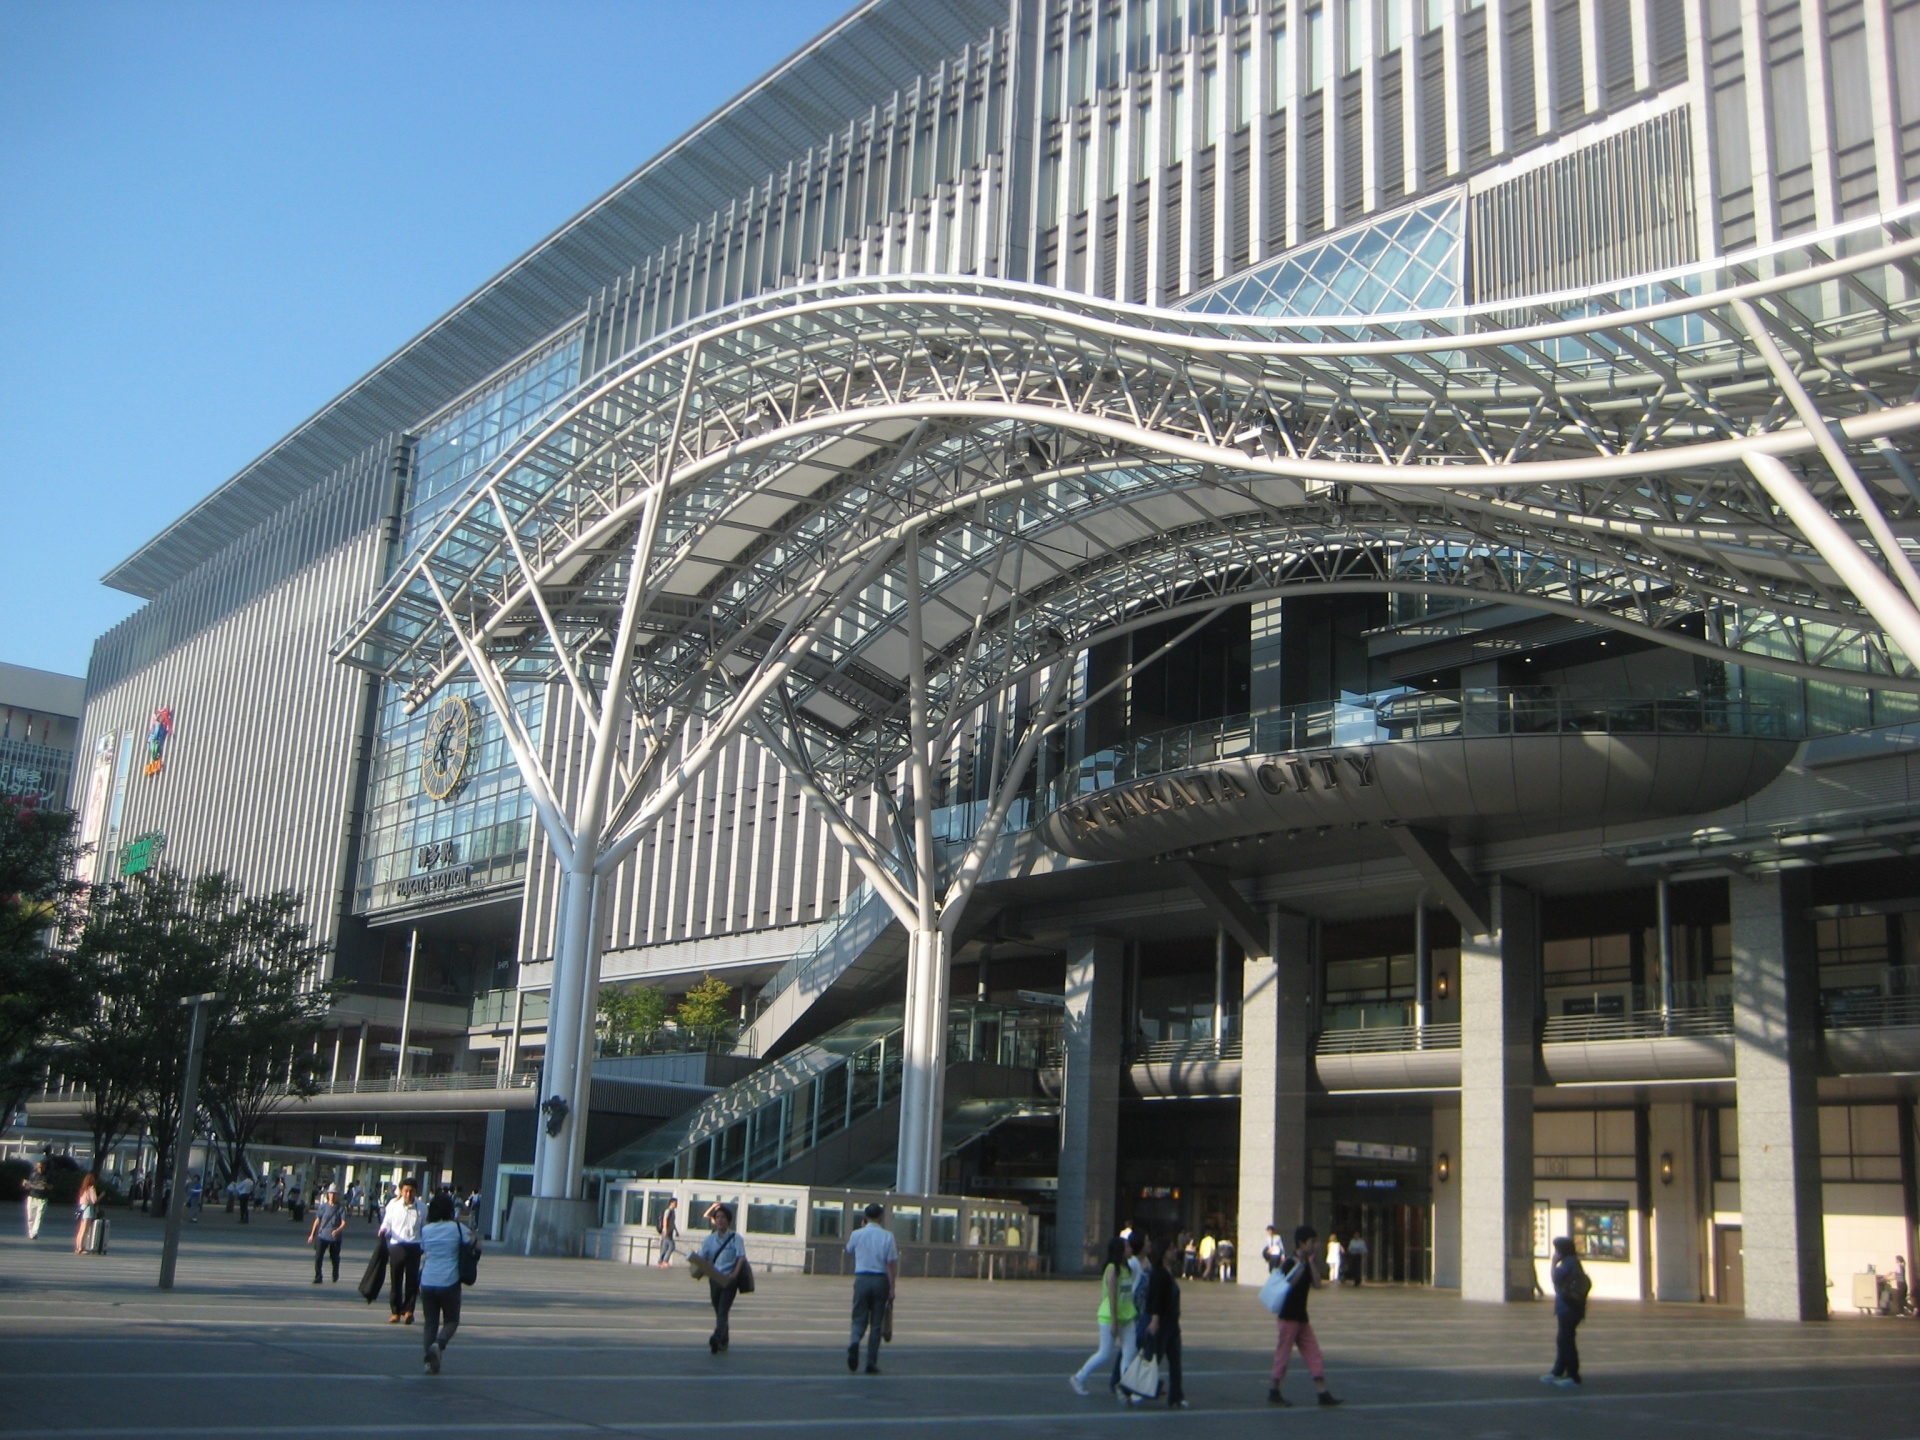 CUsersikeda-kDesktop博多駅